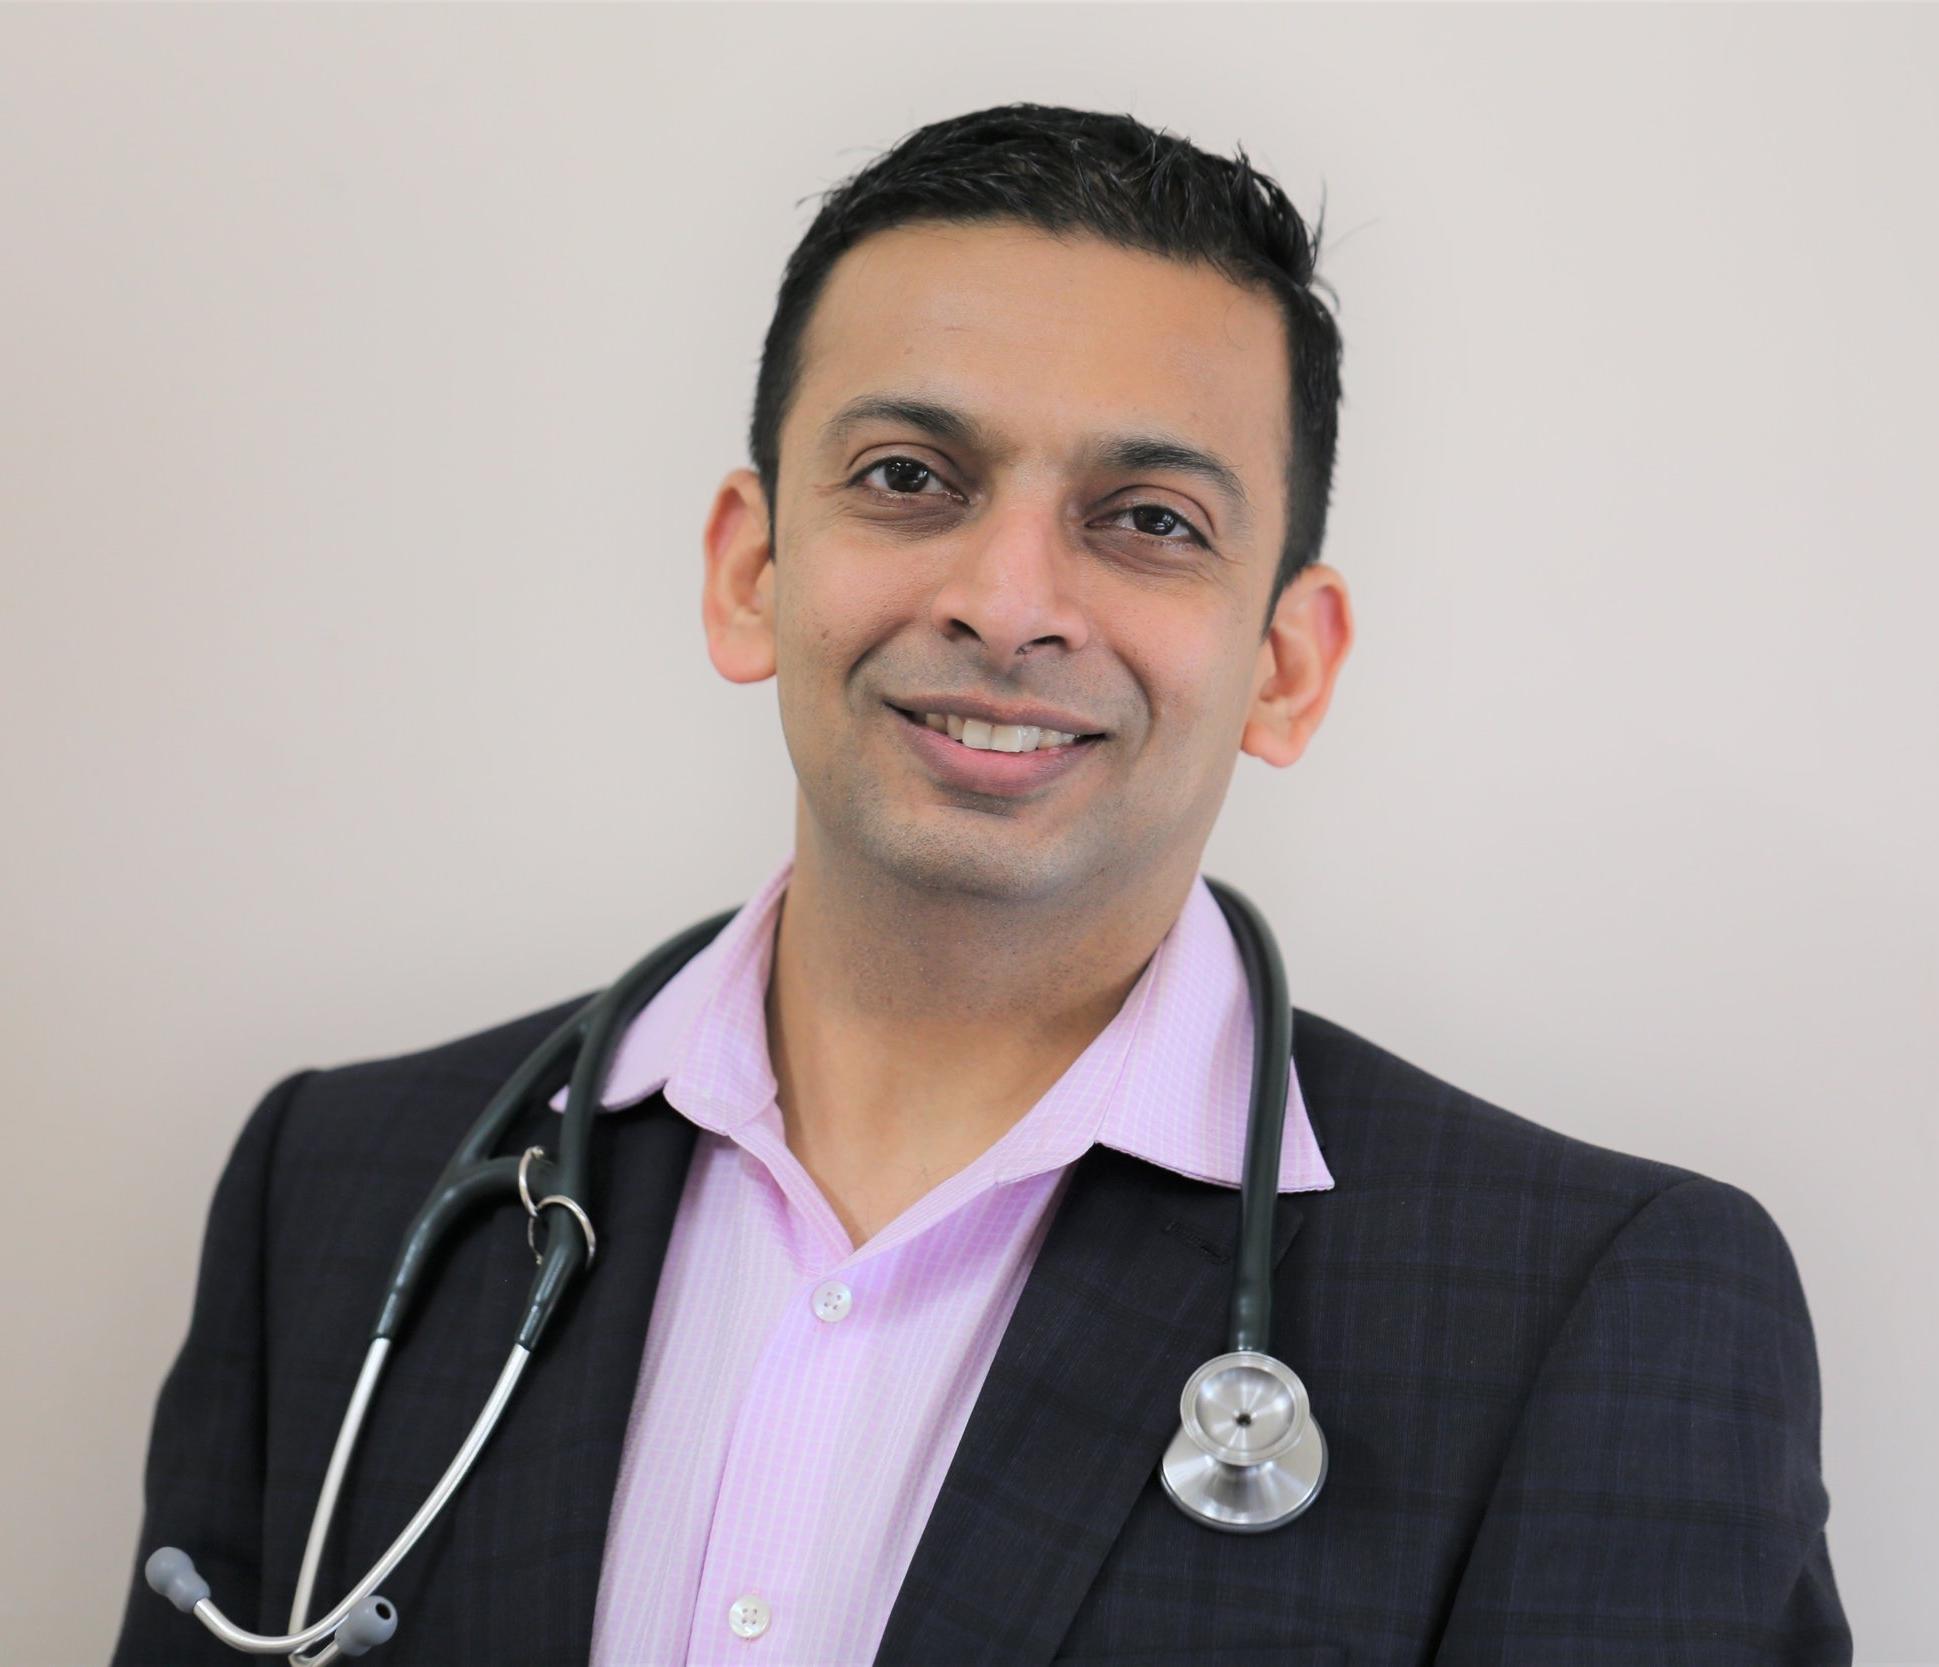 Dr Rajan Anand